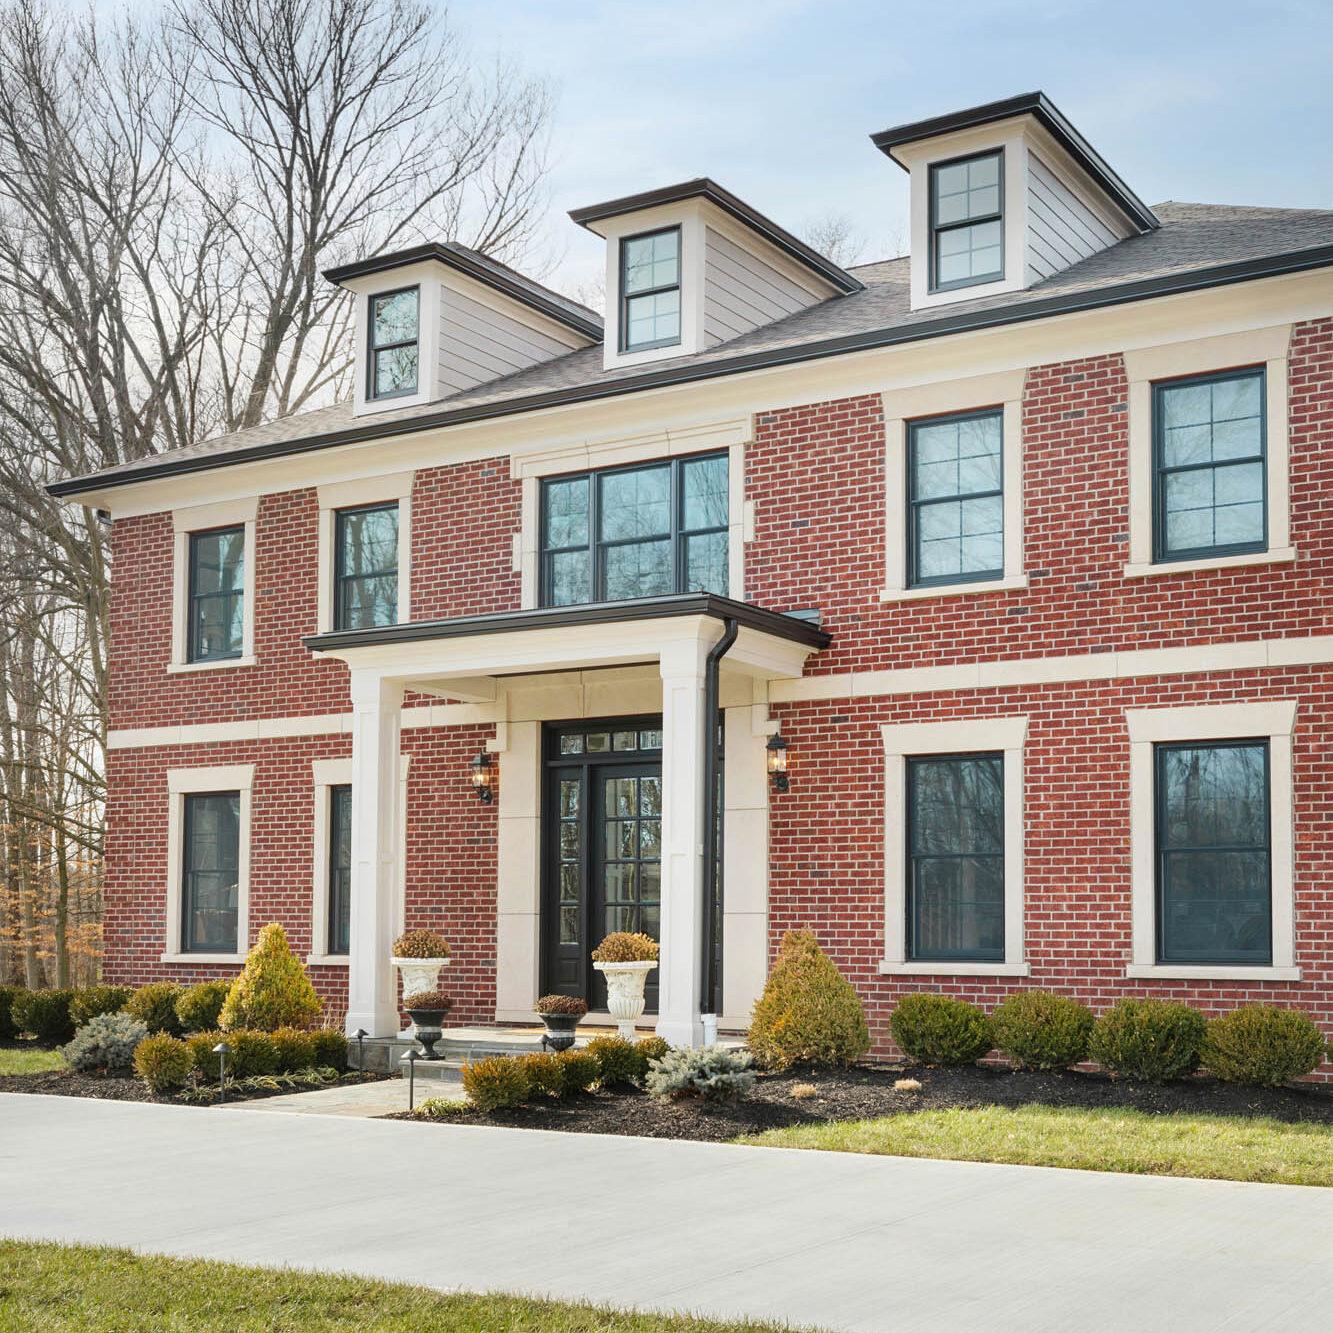 Shadyglen exterior Indian Hill custom home builder